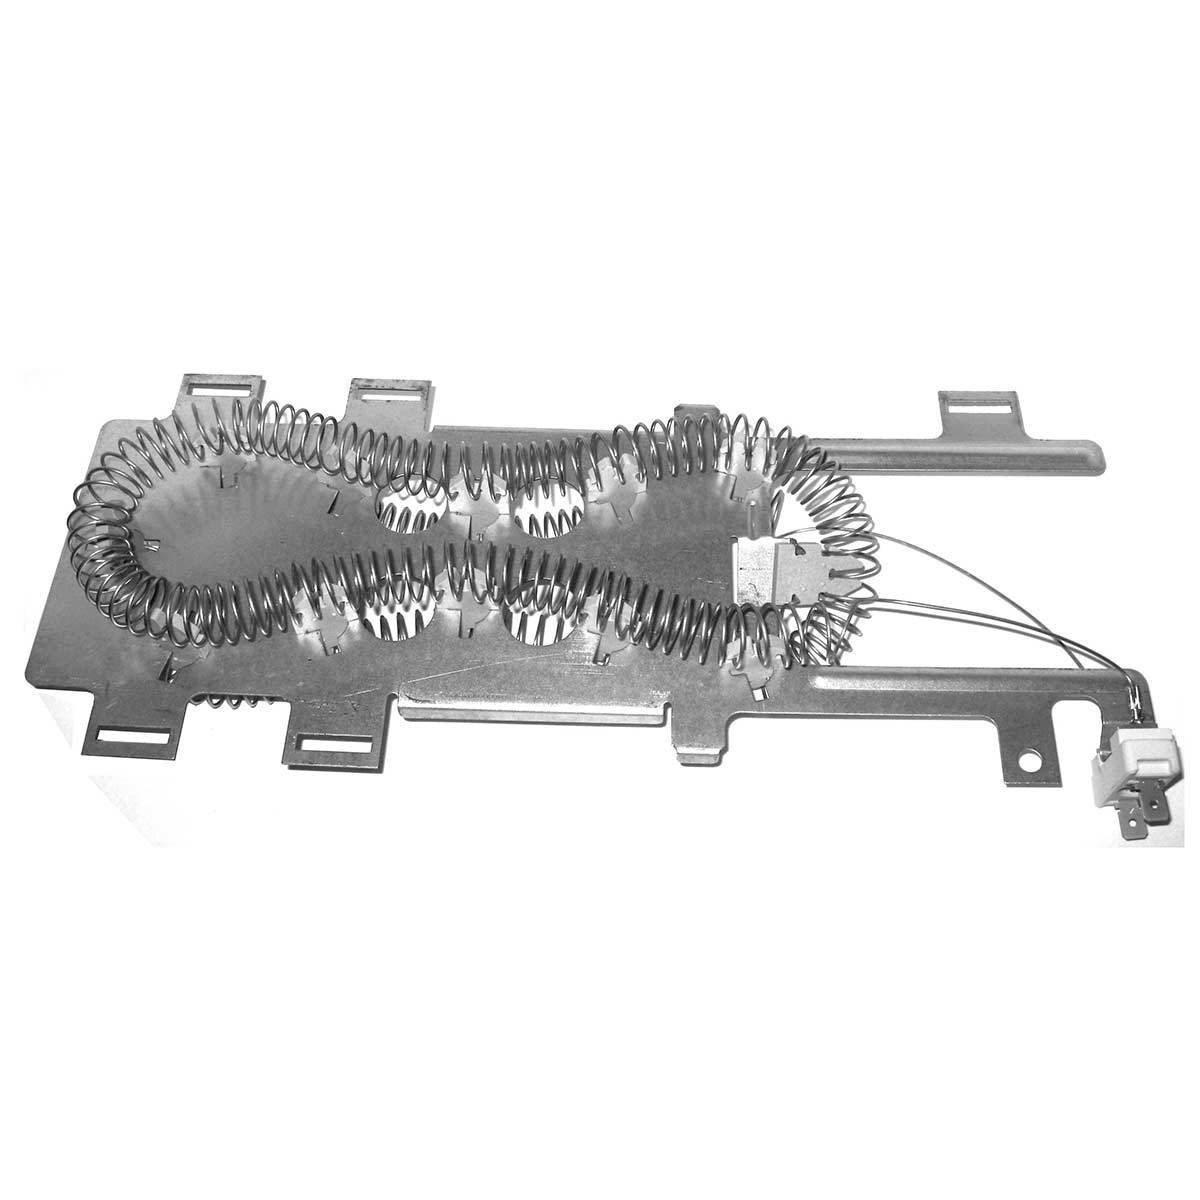 Siwdoy 8544771 Dryer Heating Element for Whirlpool Kenmore Maytag Dryers PS990361, AP3866035